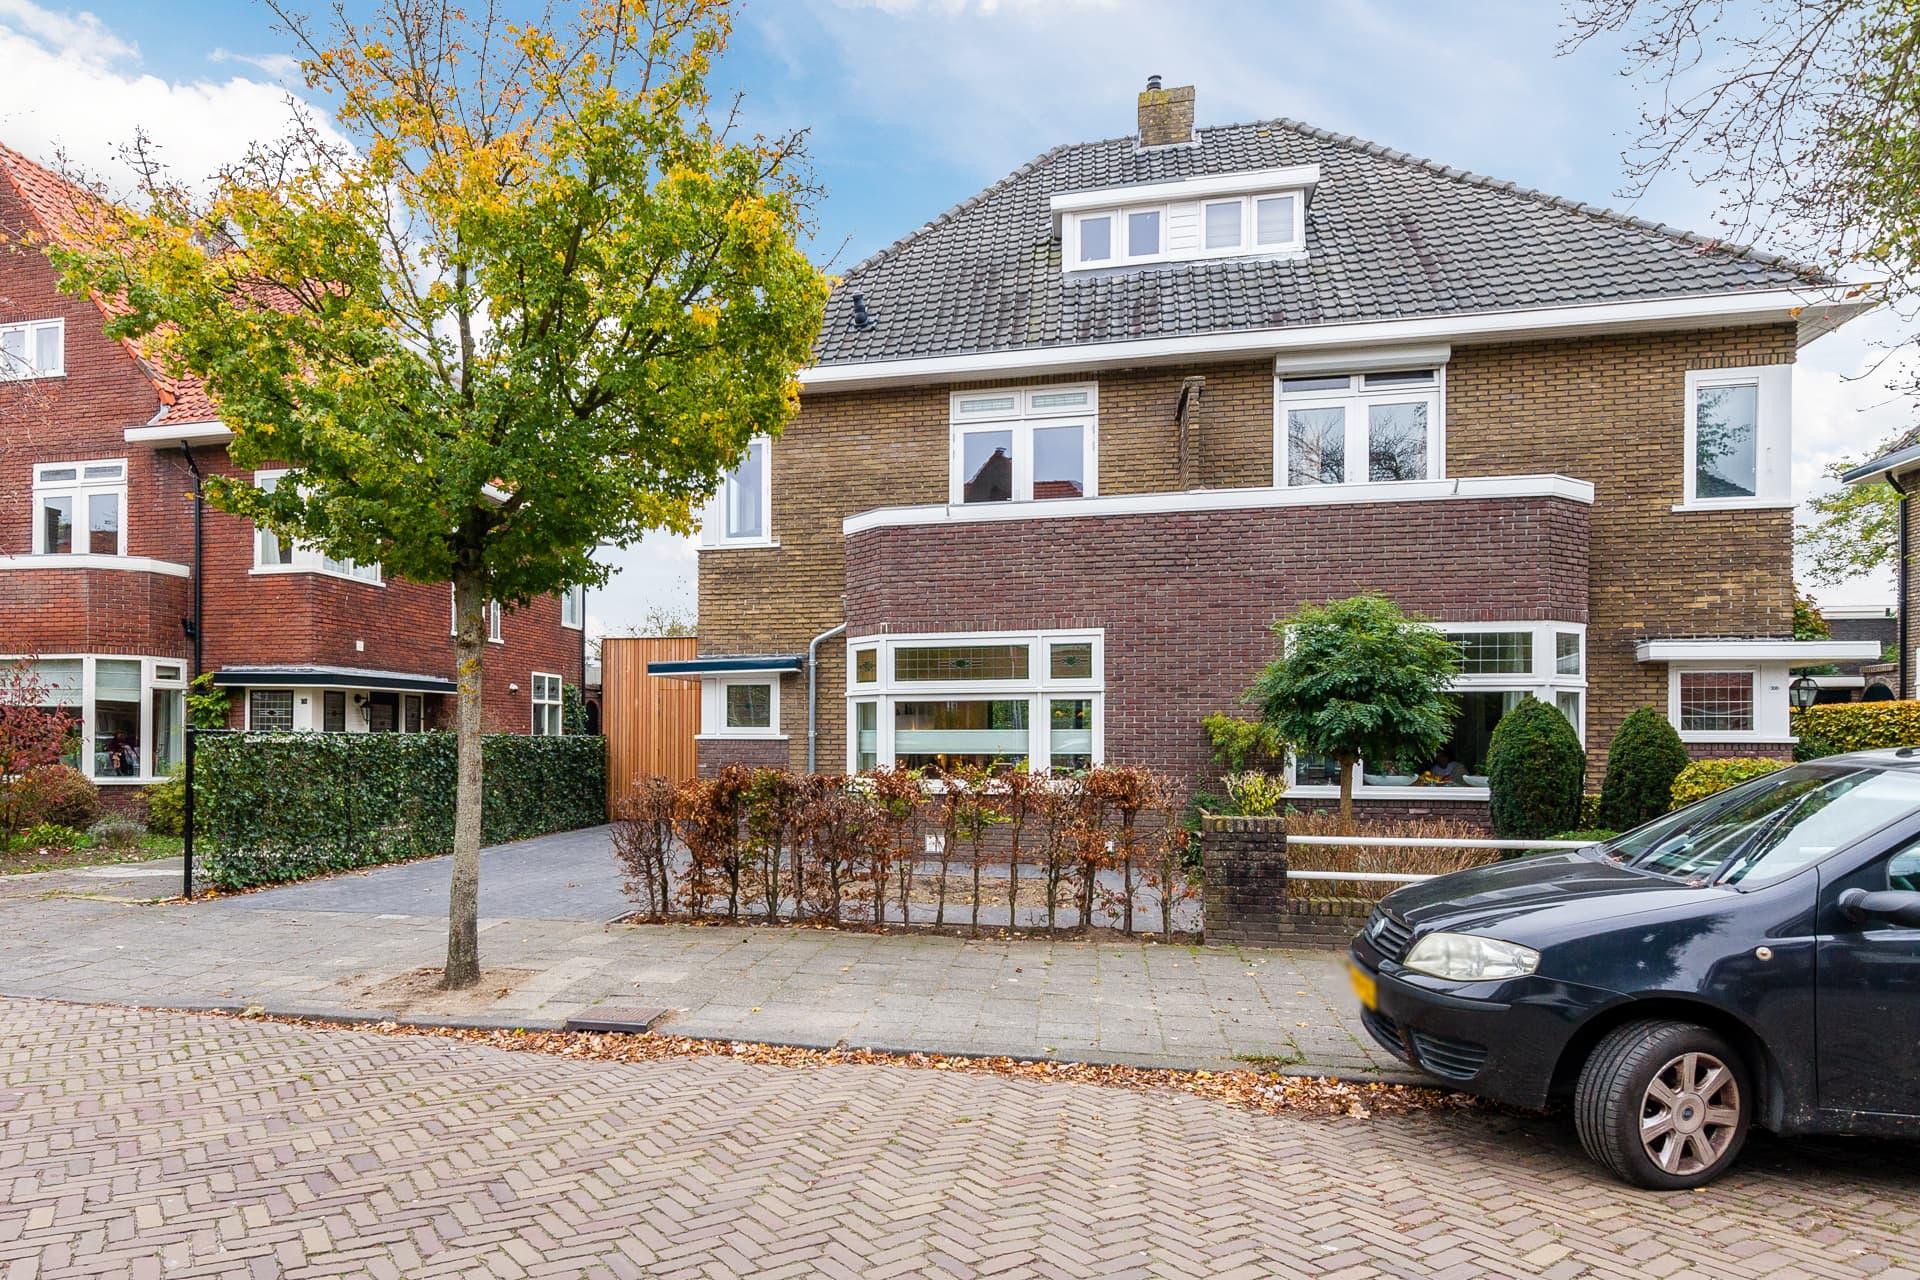 van-Os-architecten-verbouwing-2-onder-1-kapper-Valkenierslaan-Breda-voorgevel-straat